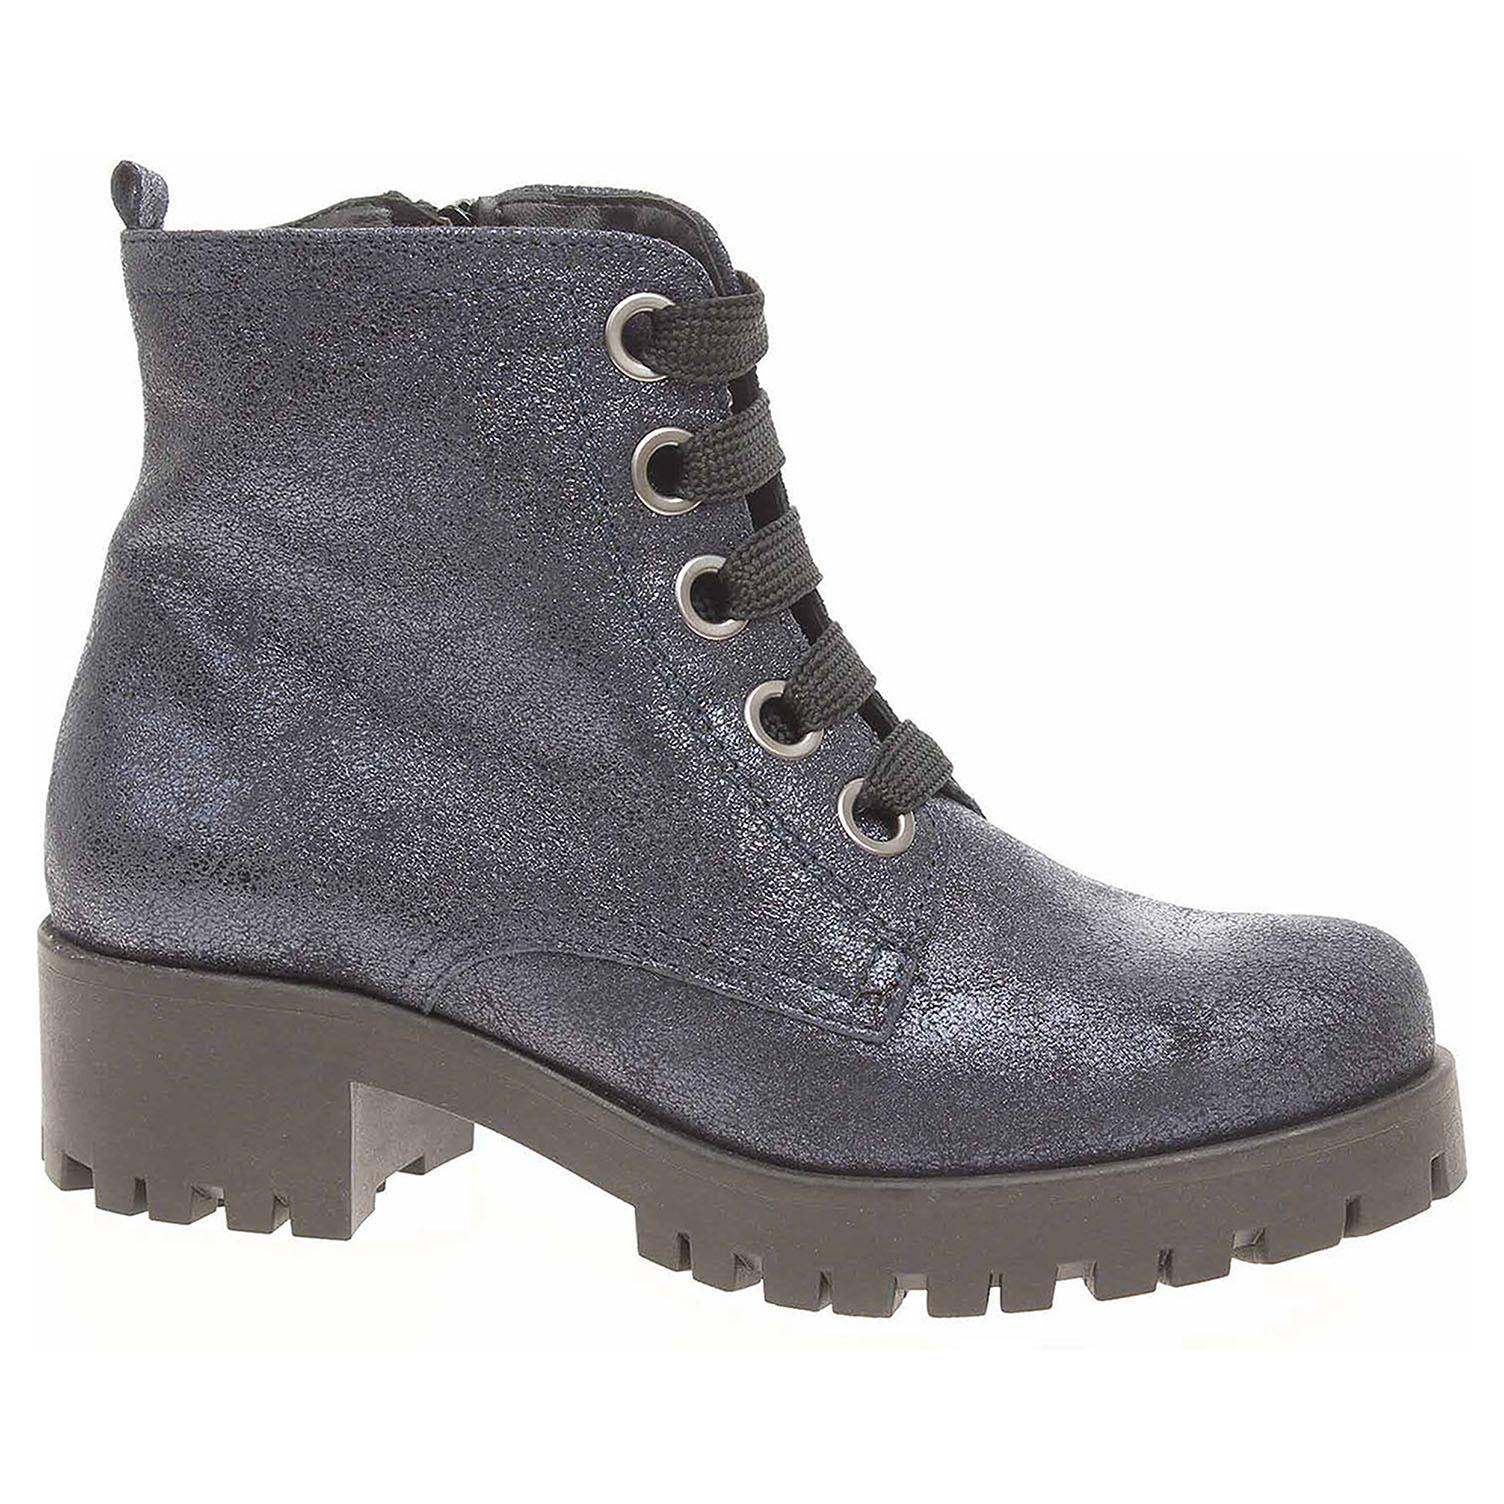 7f3e67373db43 Ecco Dámská kotníková obuv Tamaris 1-25217-39 navy metallic 22400654